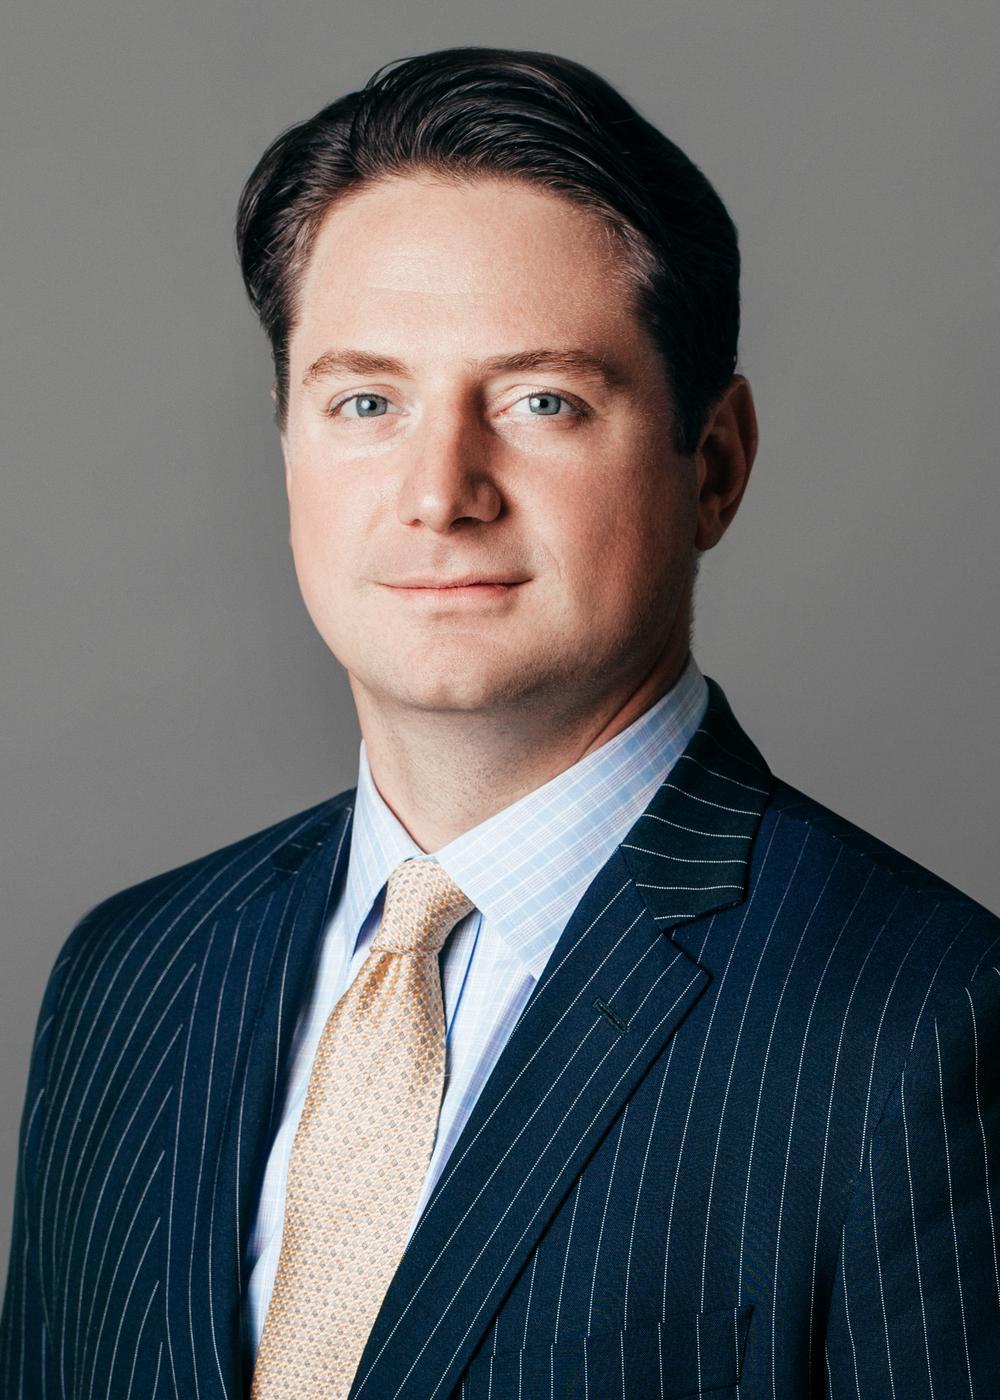 Matthew W. Sexton, CFP®, CIMA®, MSFP Photo